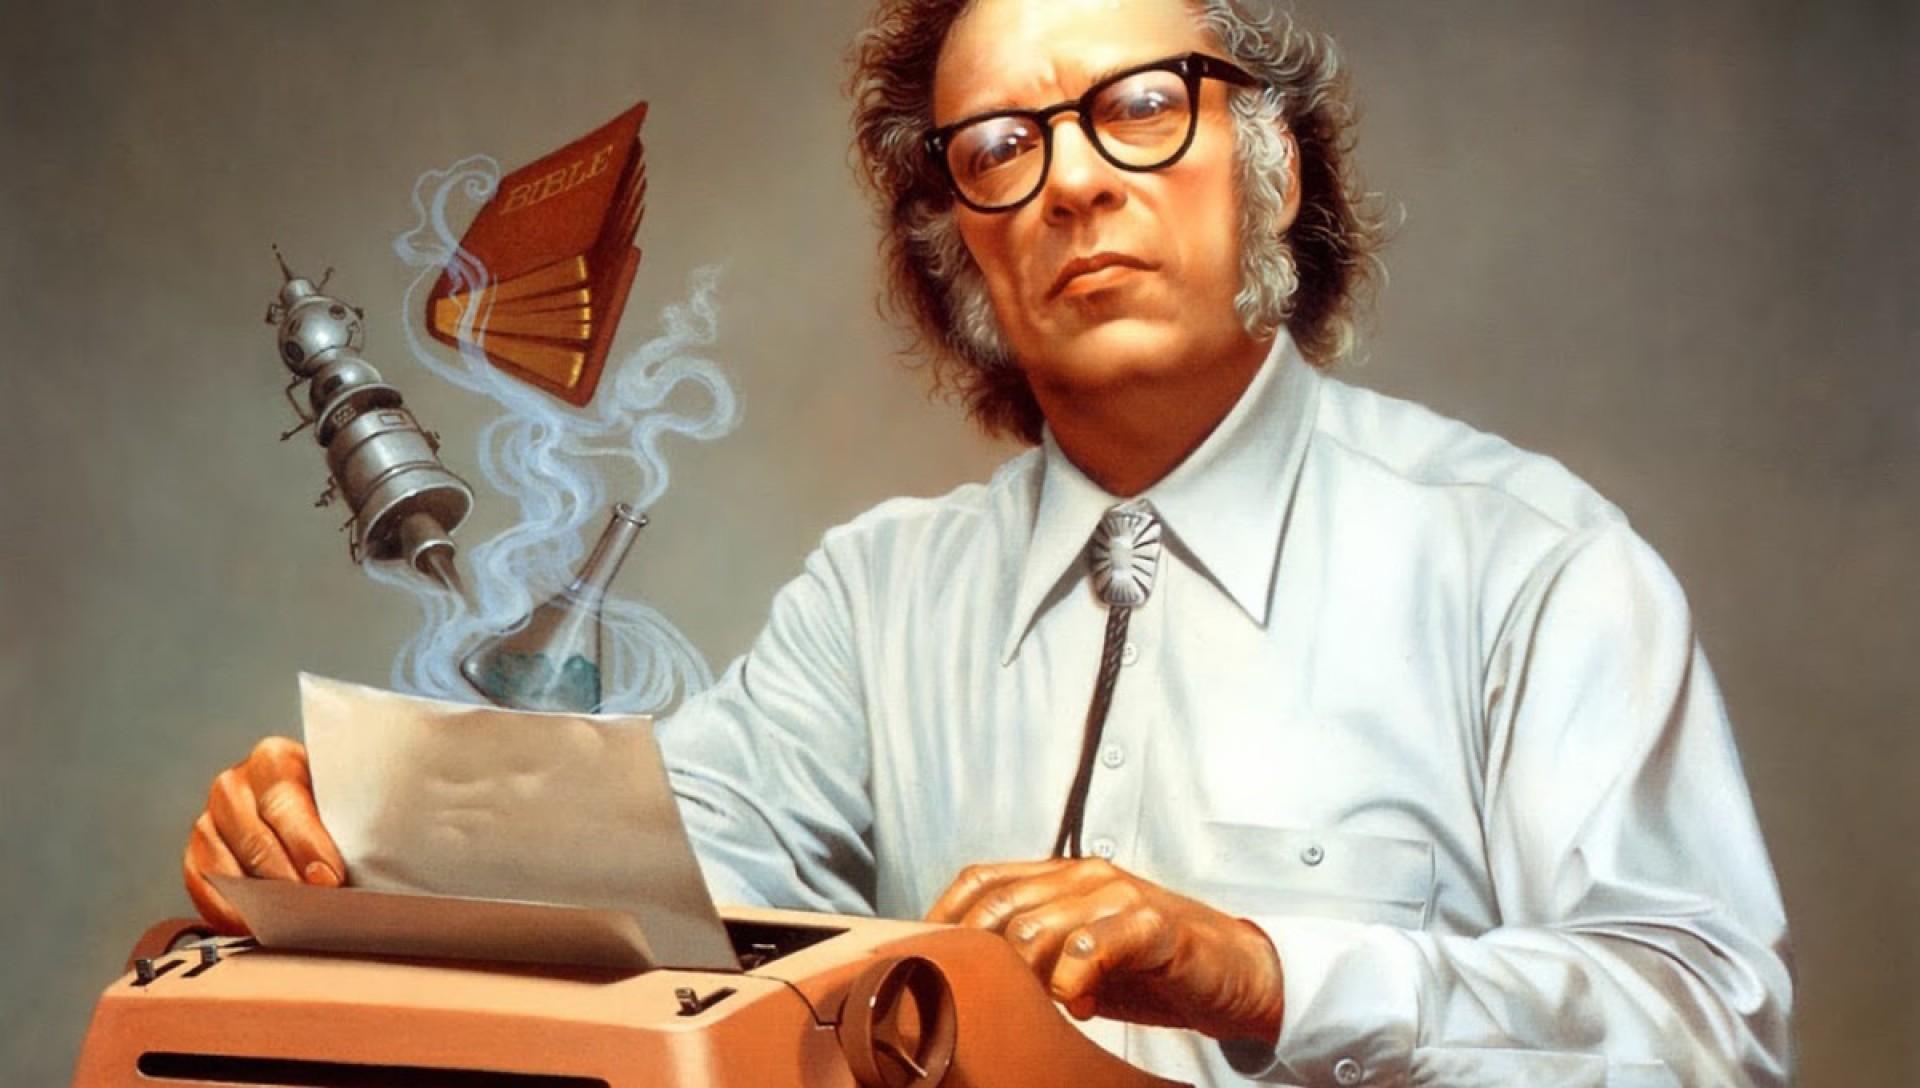 002 Essay Example Isaac Asimov Essays Rowena Awful On Creativity Intelligence 1920